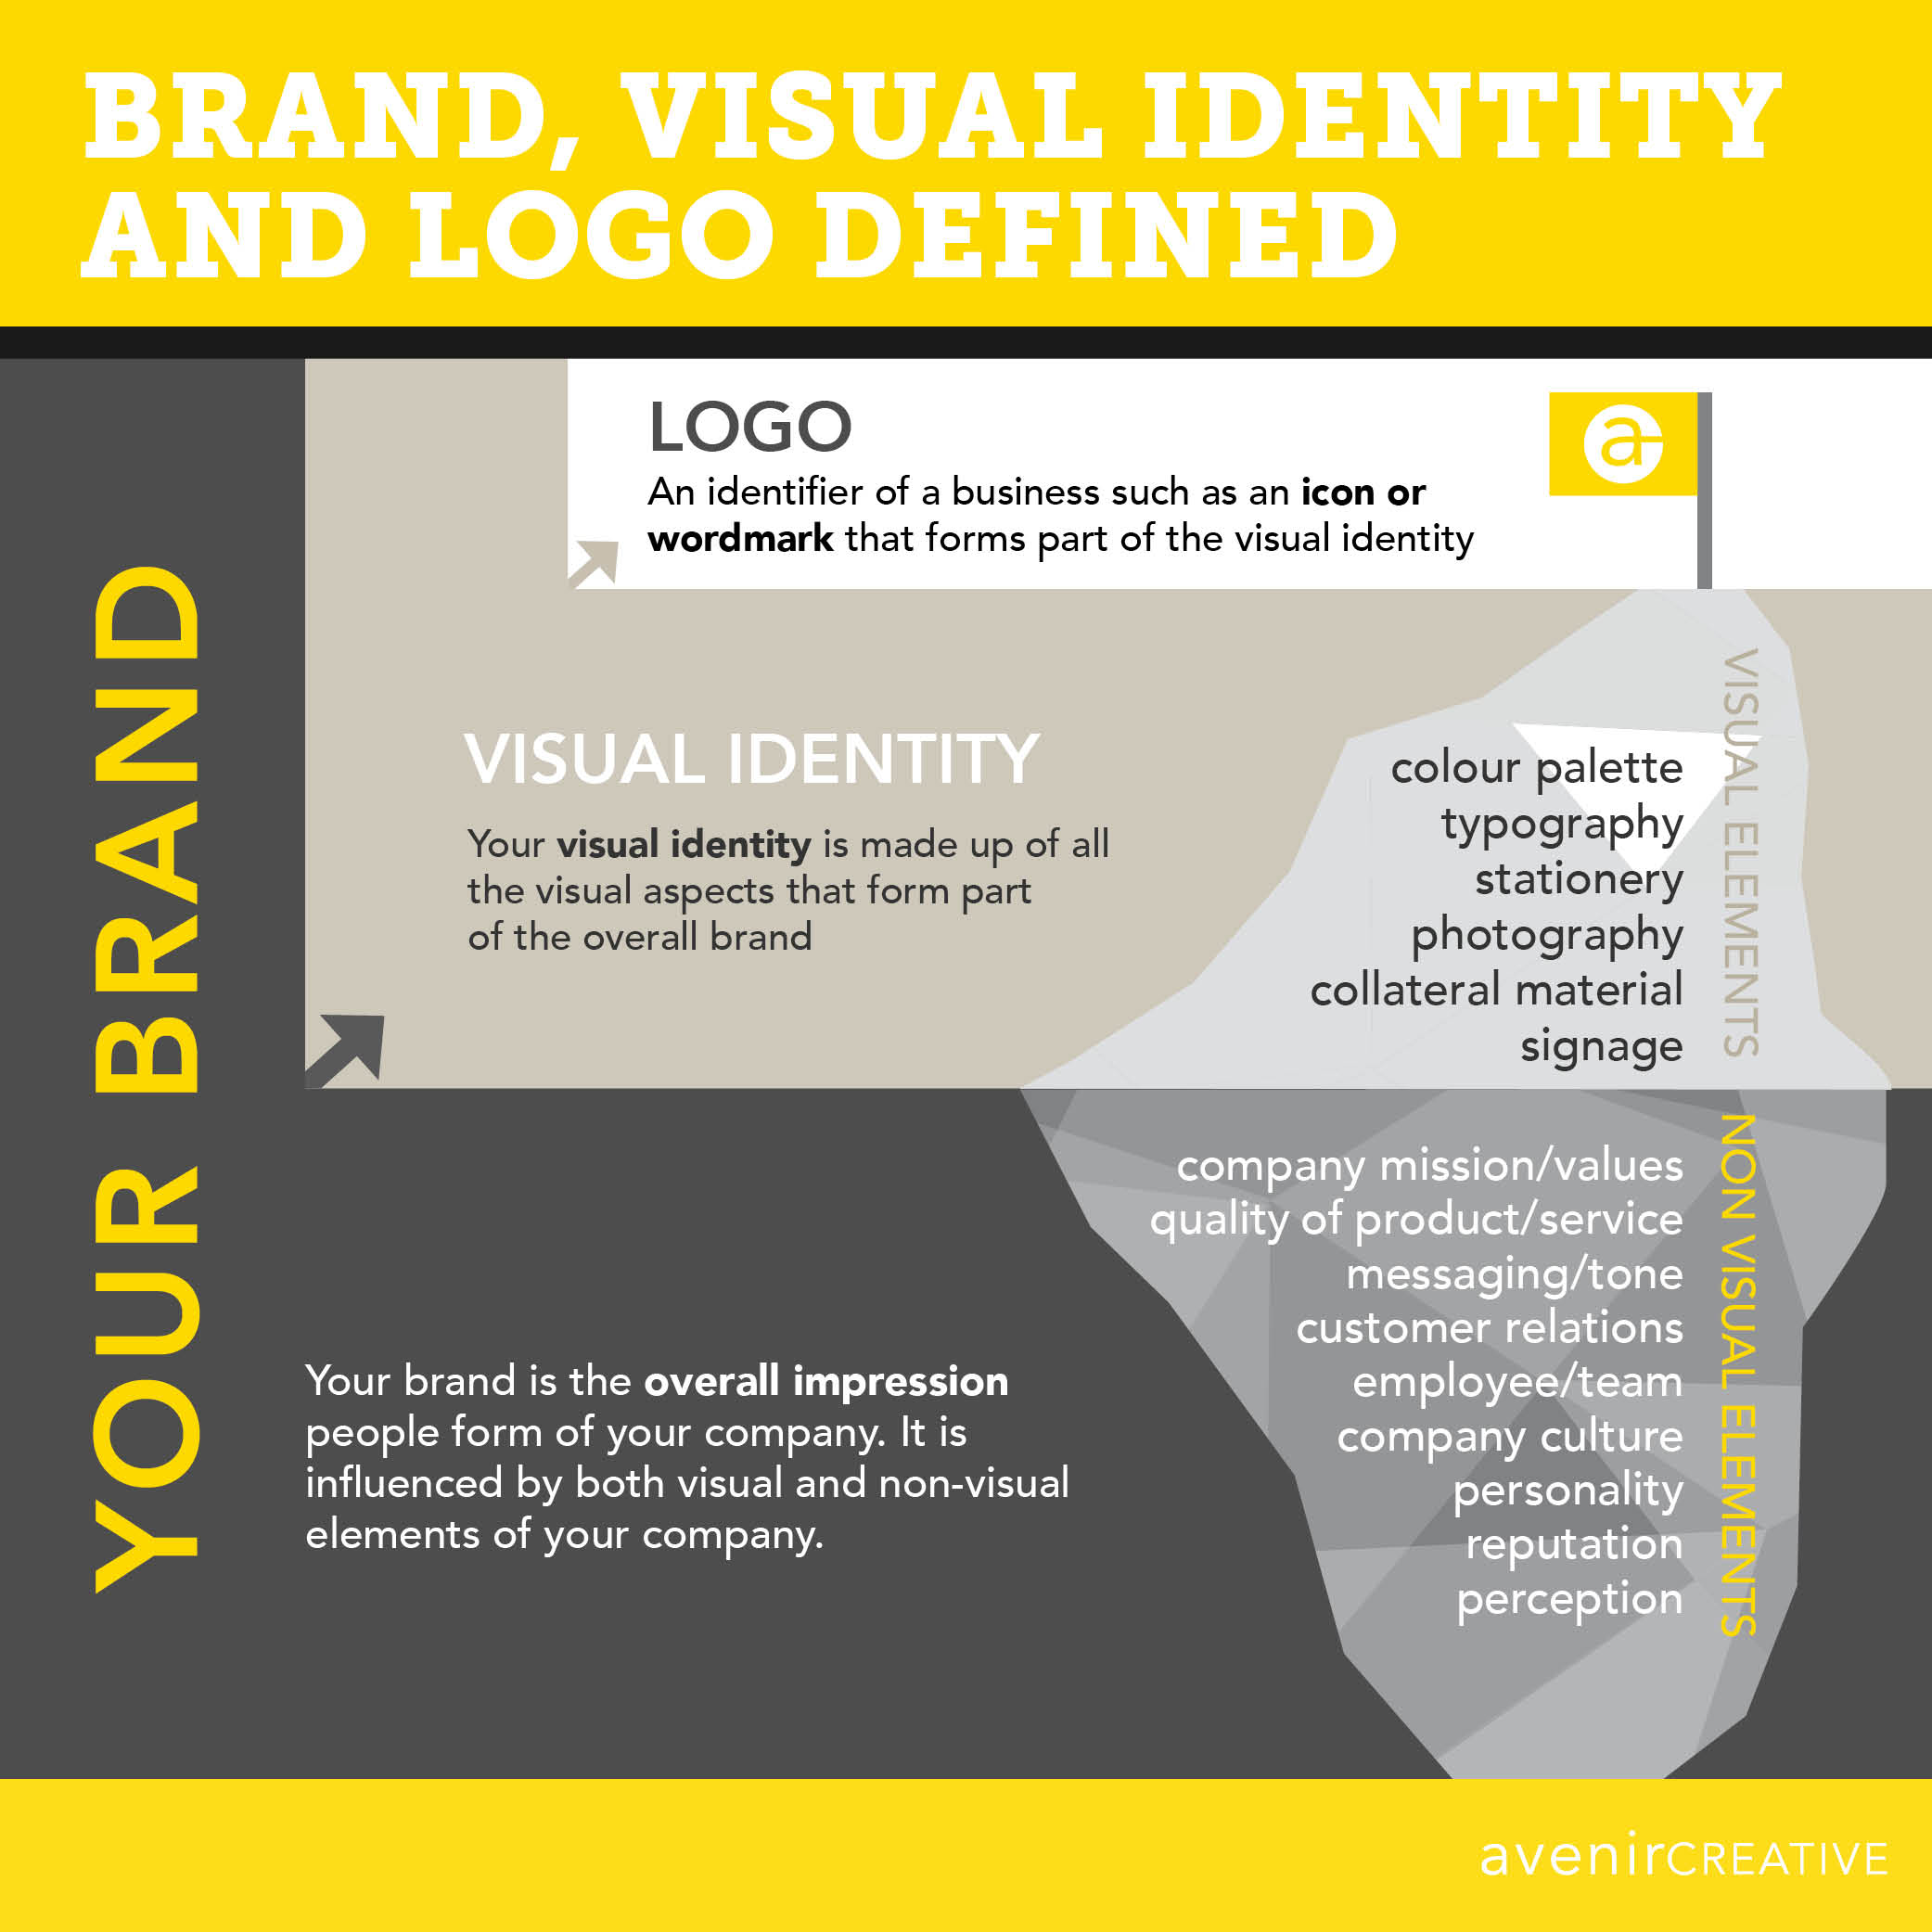 avenircreative-Brand-vs.-Visual-Identity.jpg